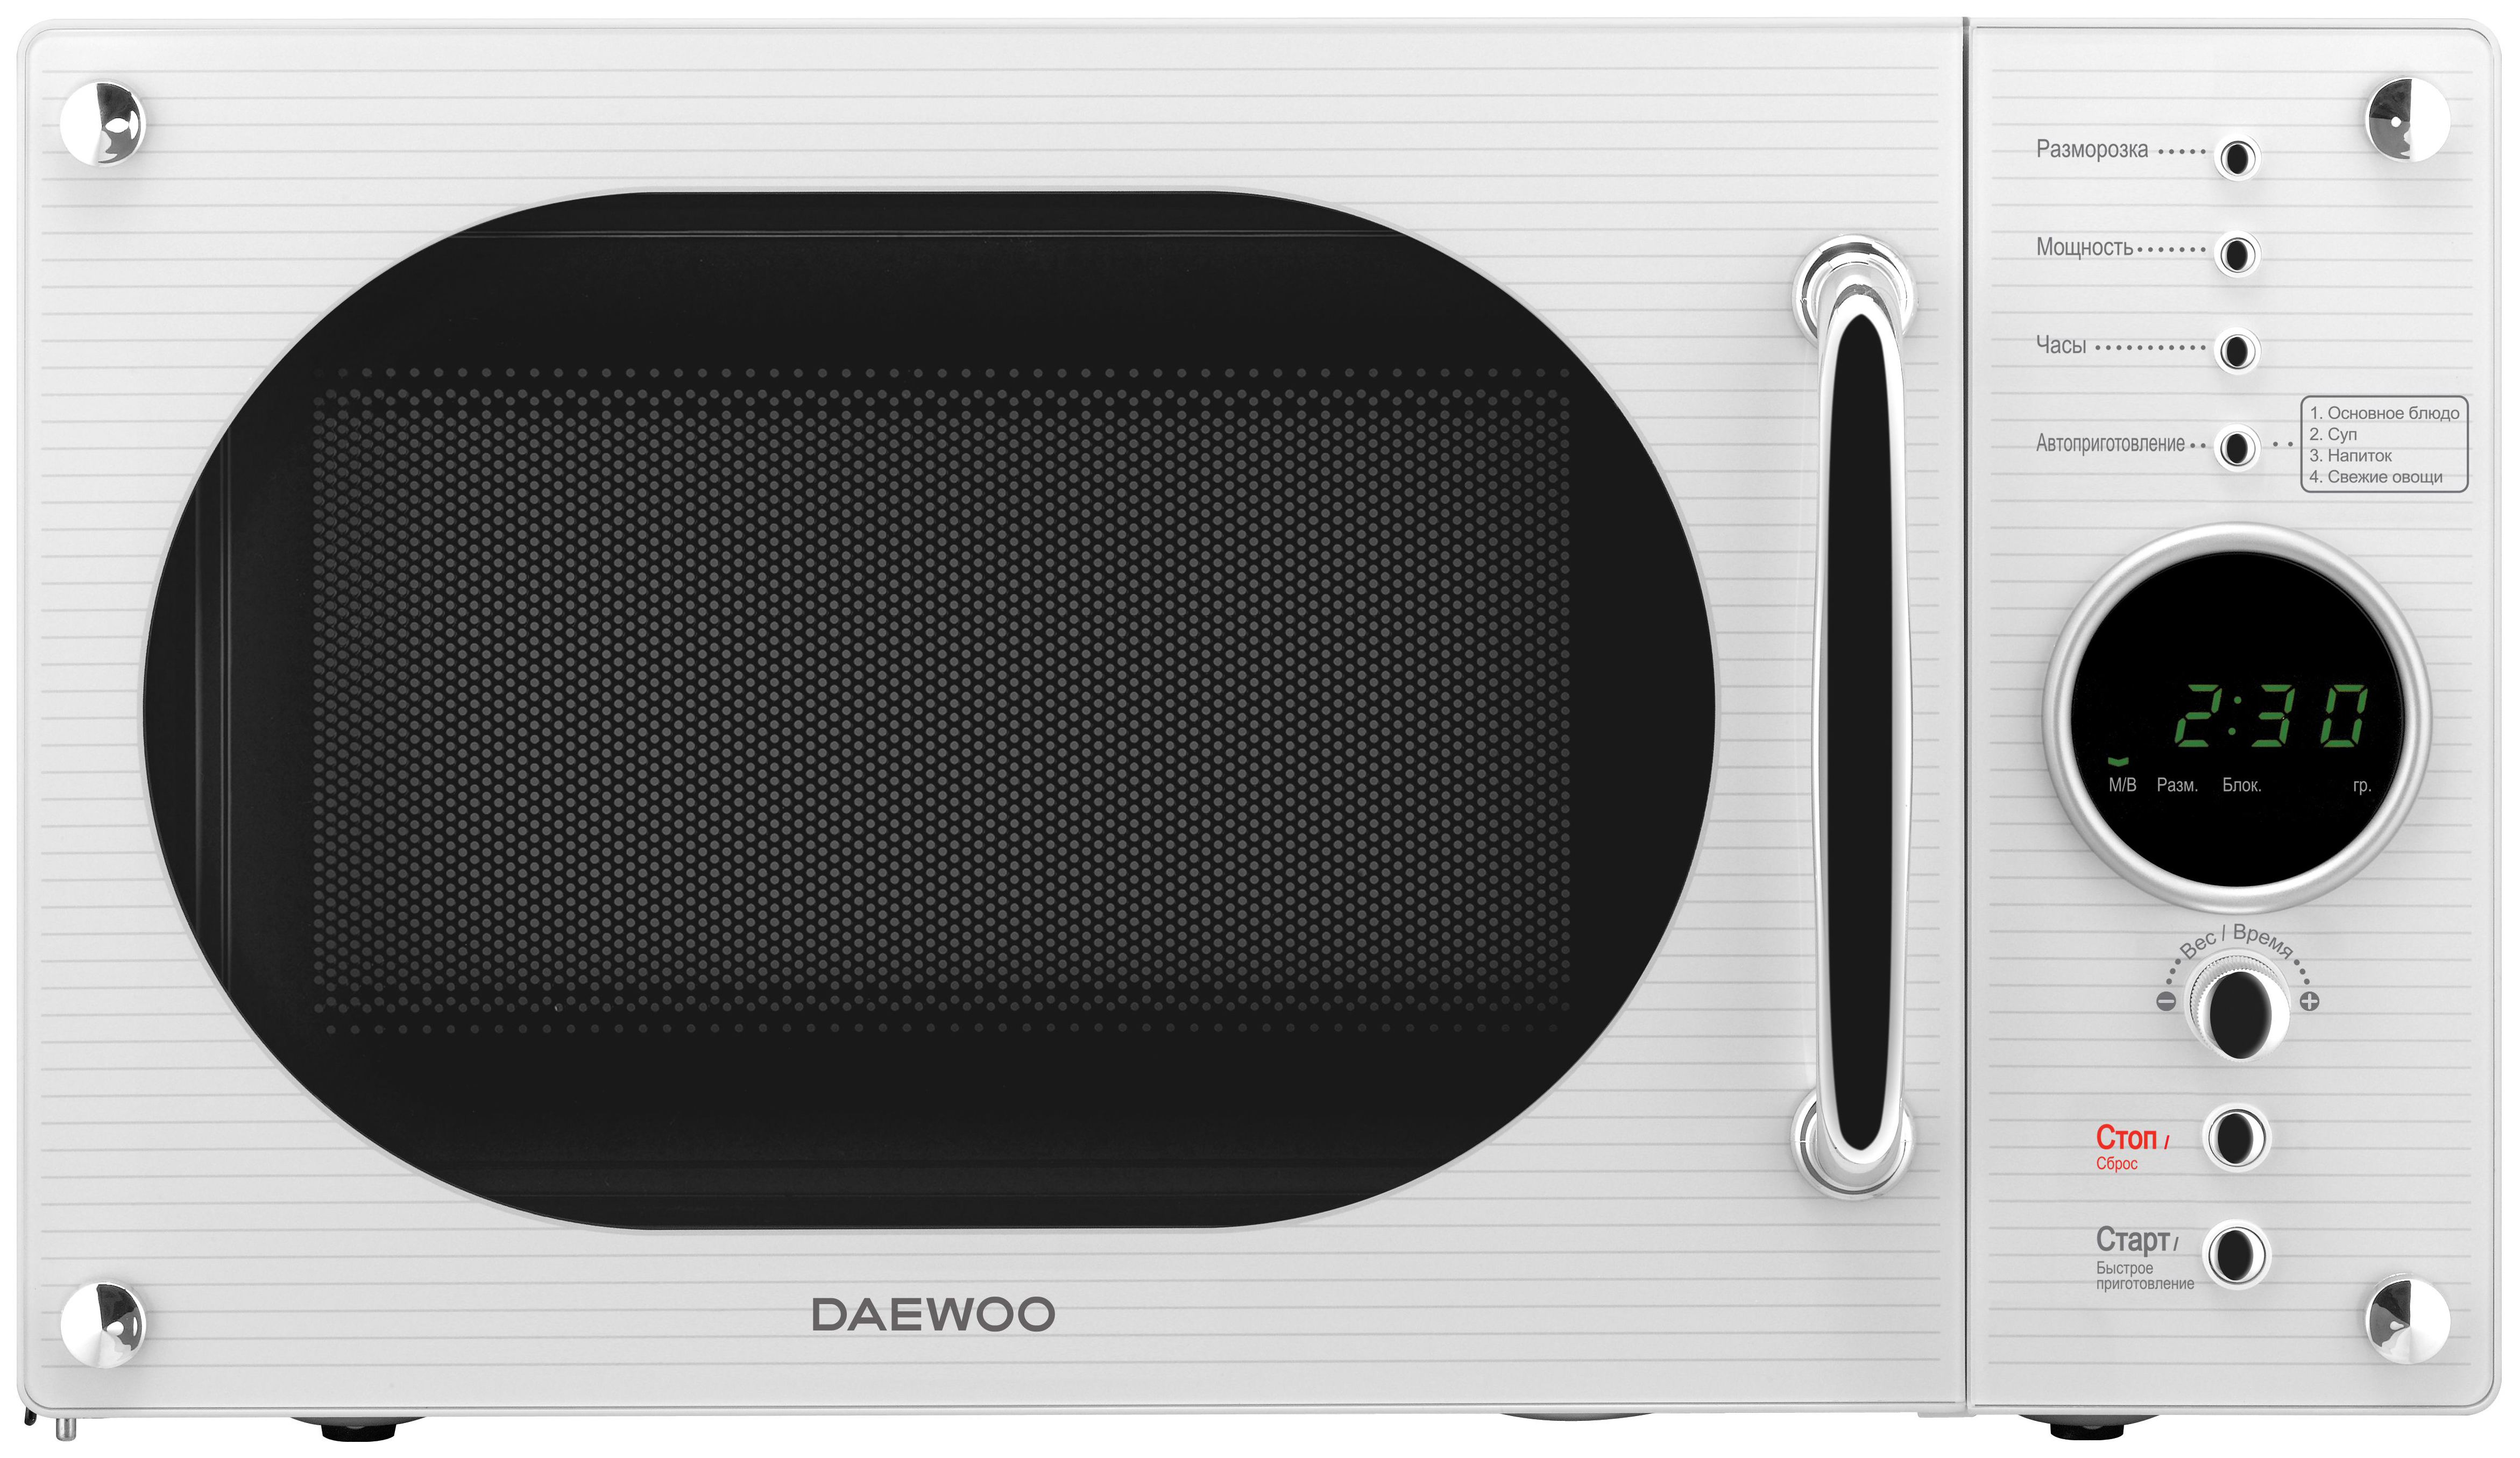 Микроволновая печь соло Daewoo KOR 819RW white